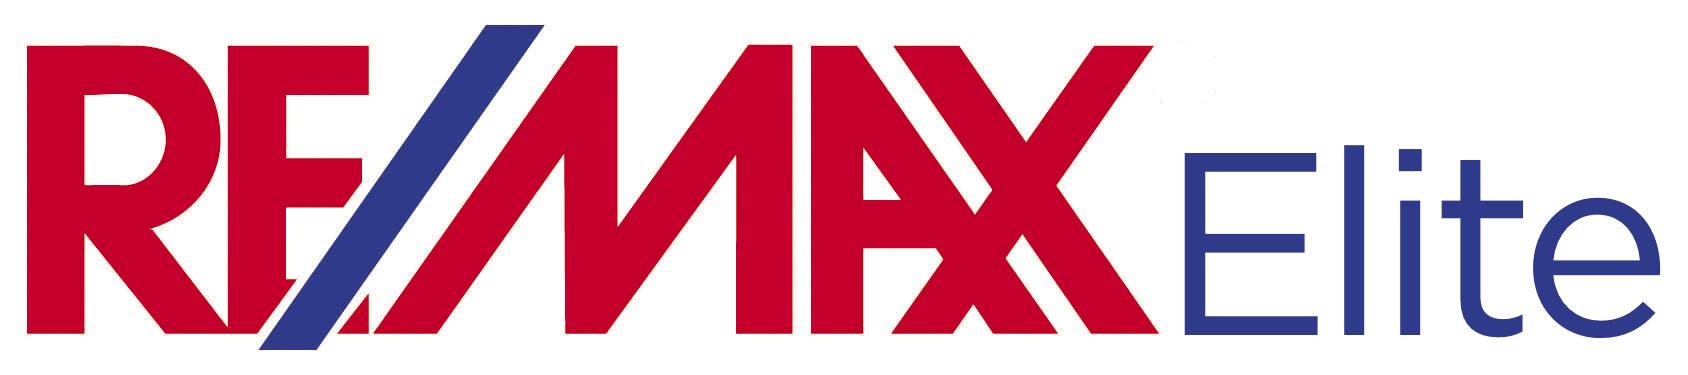 The Homer Group - RE/MAX Elite logo